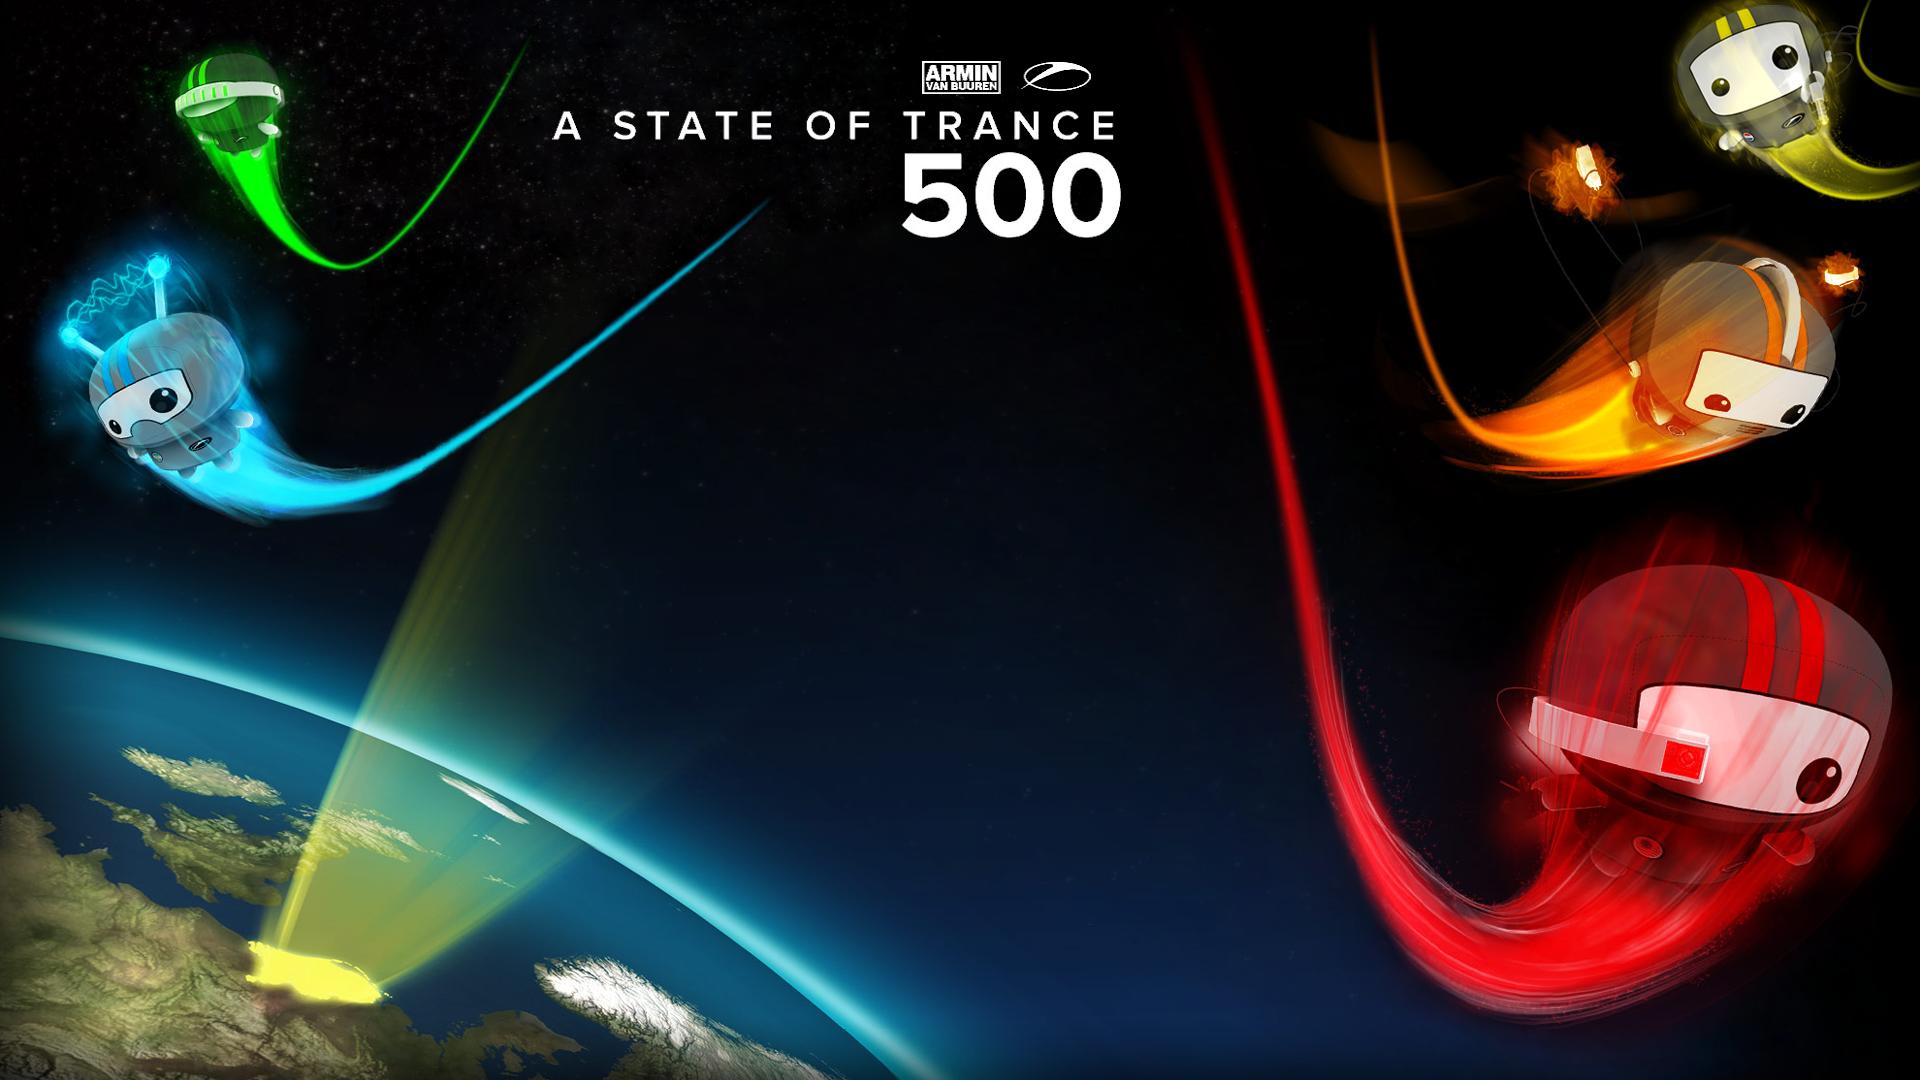 A state of trance 387 скачать - 1a014